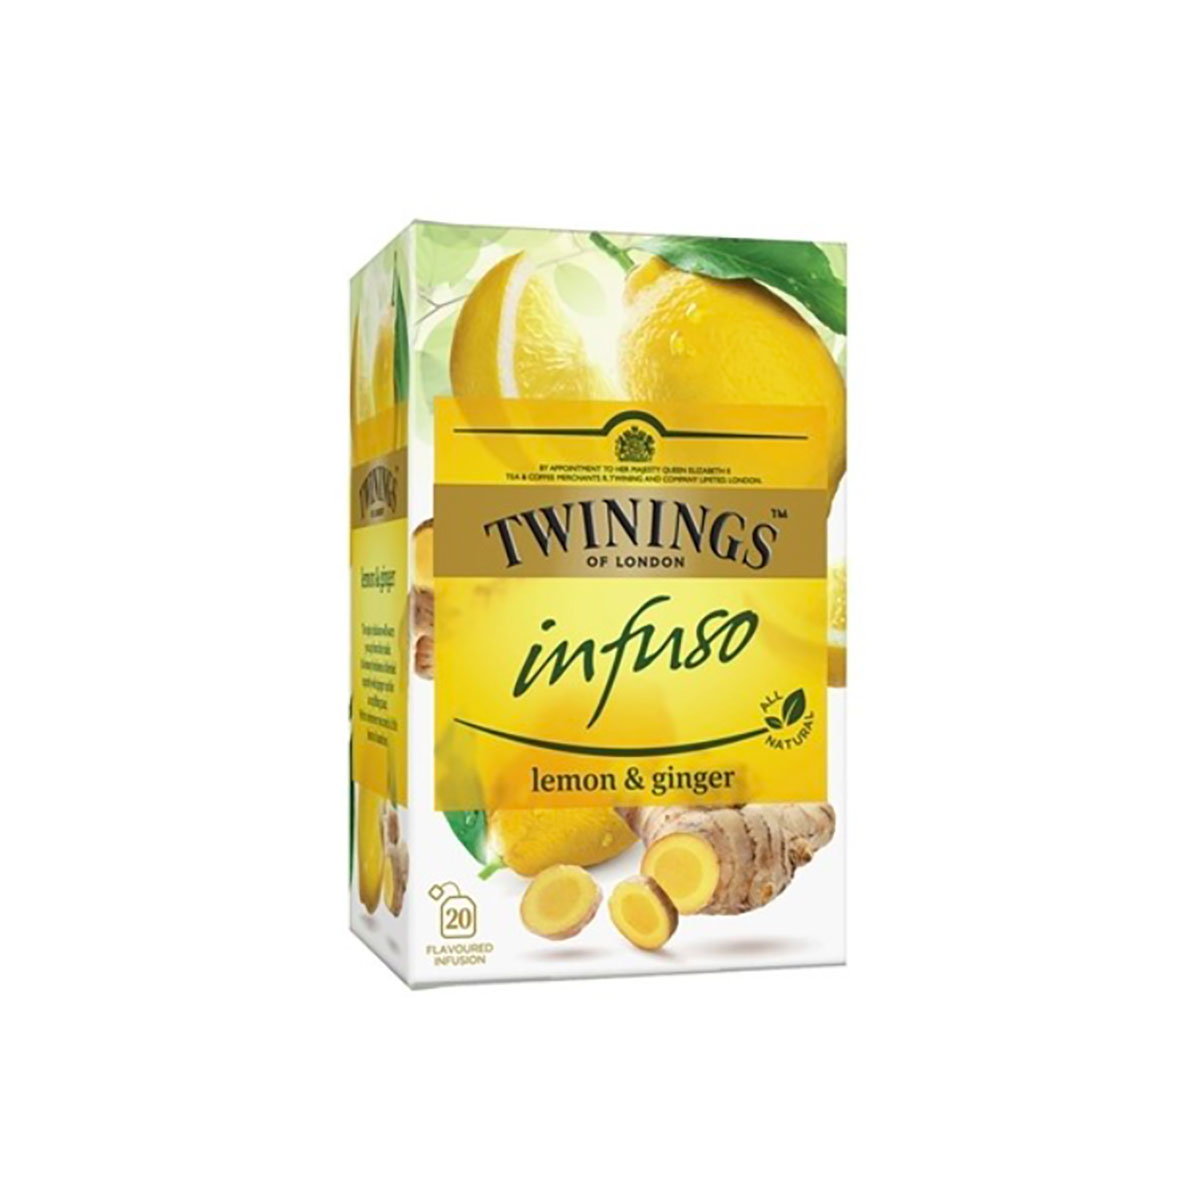 Ceai infuzie Lamaie si Ghimbir Twinings, 20 x 1.5 g imagine